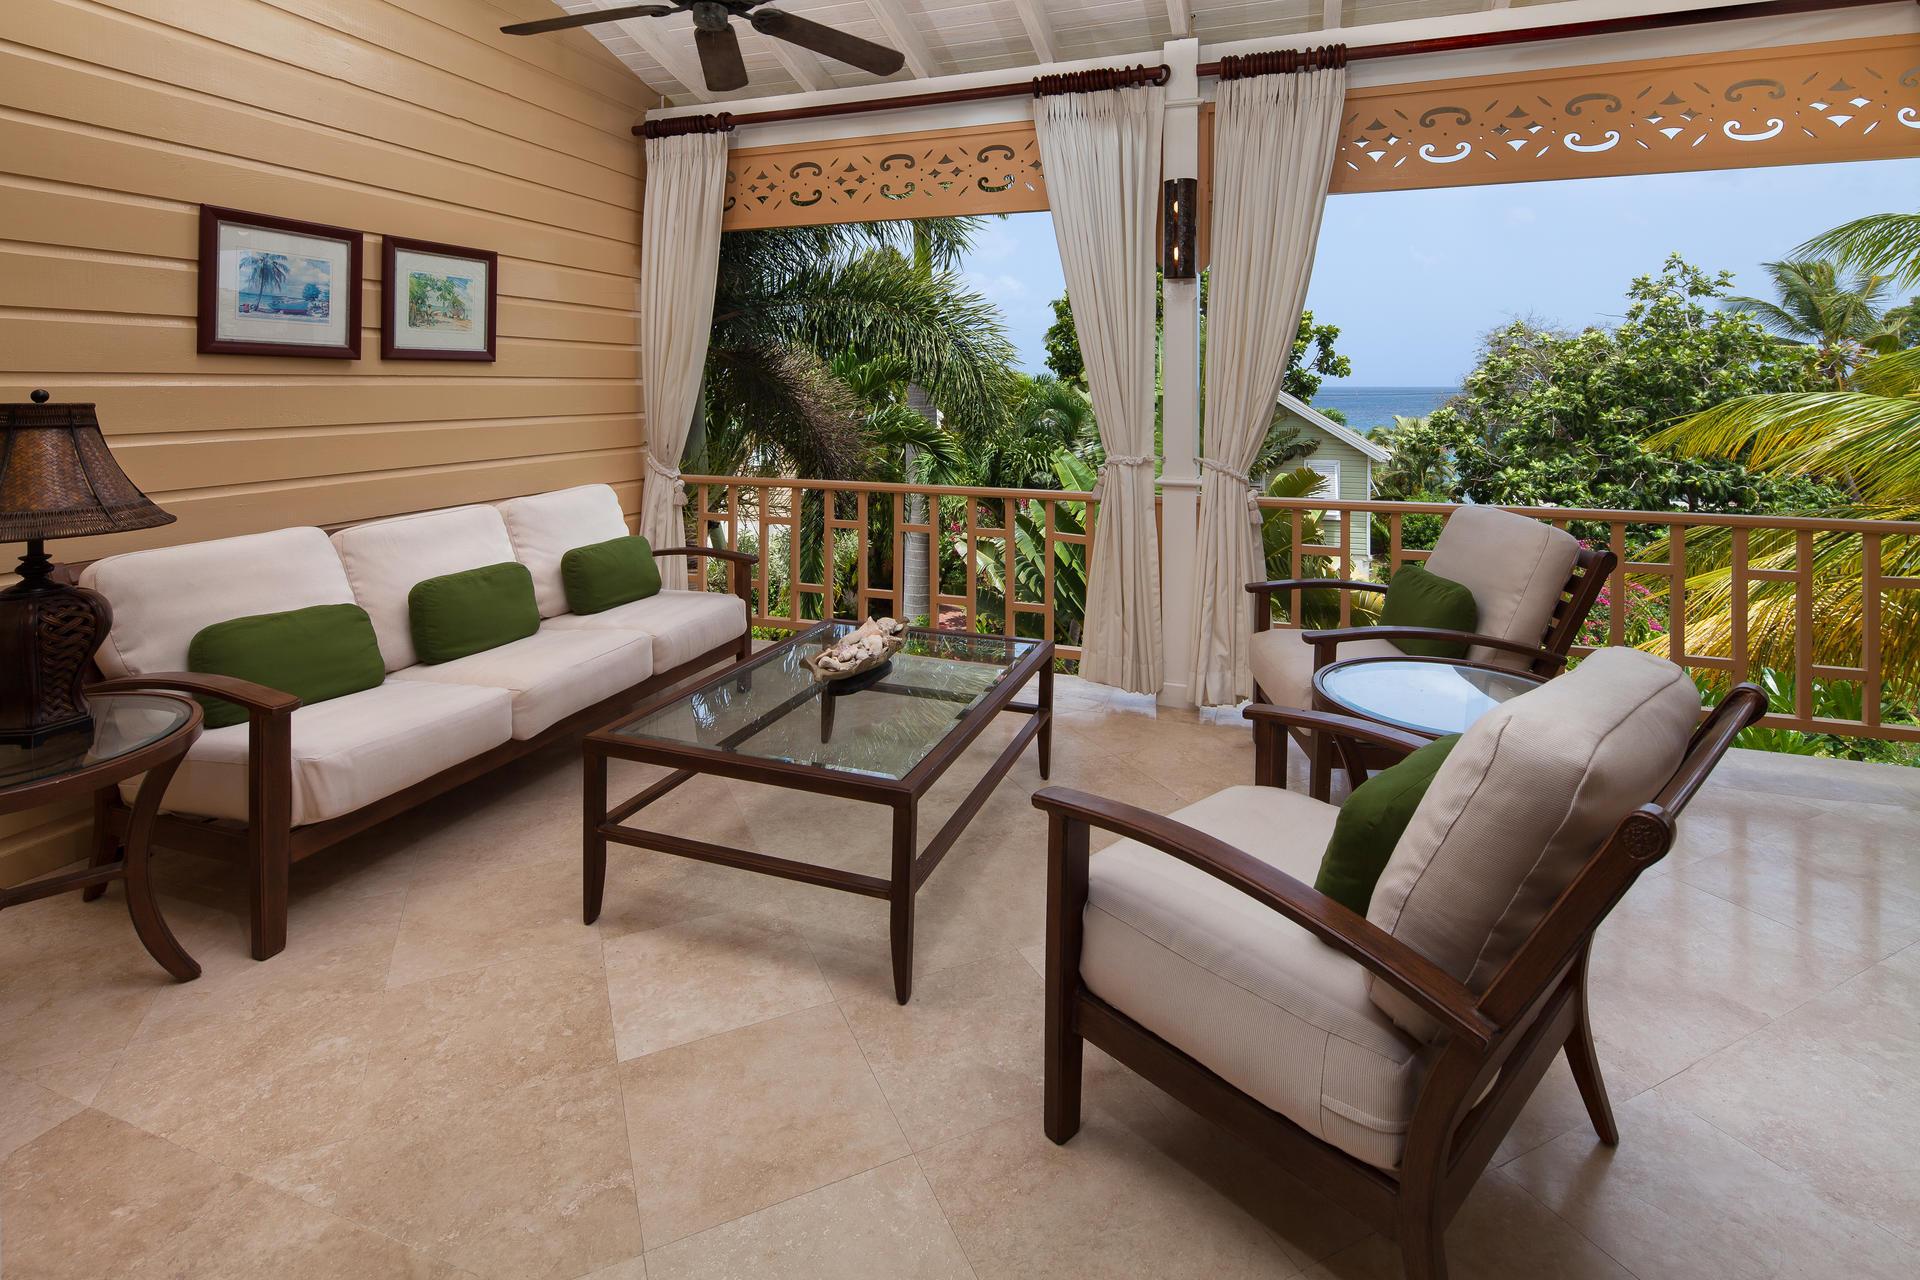 Outdoor Bedroom Rooms O Luxury One Two Three Bedroom Villas Little Good